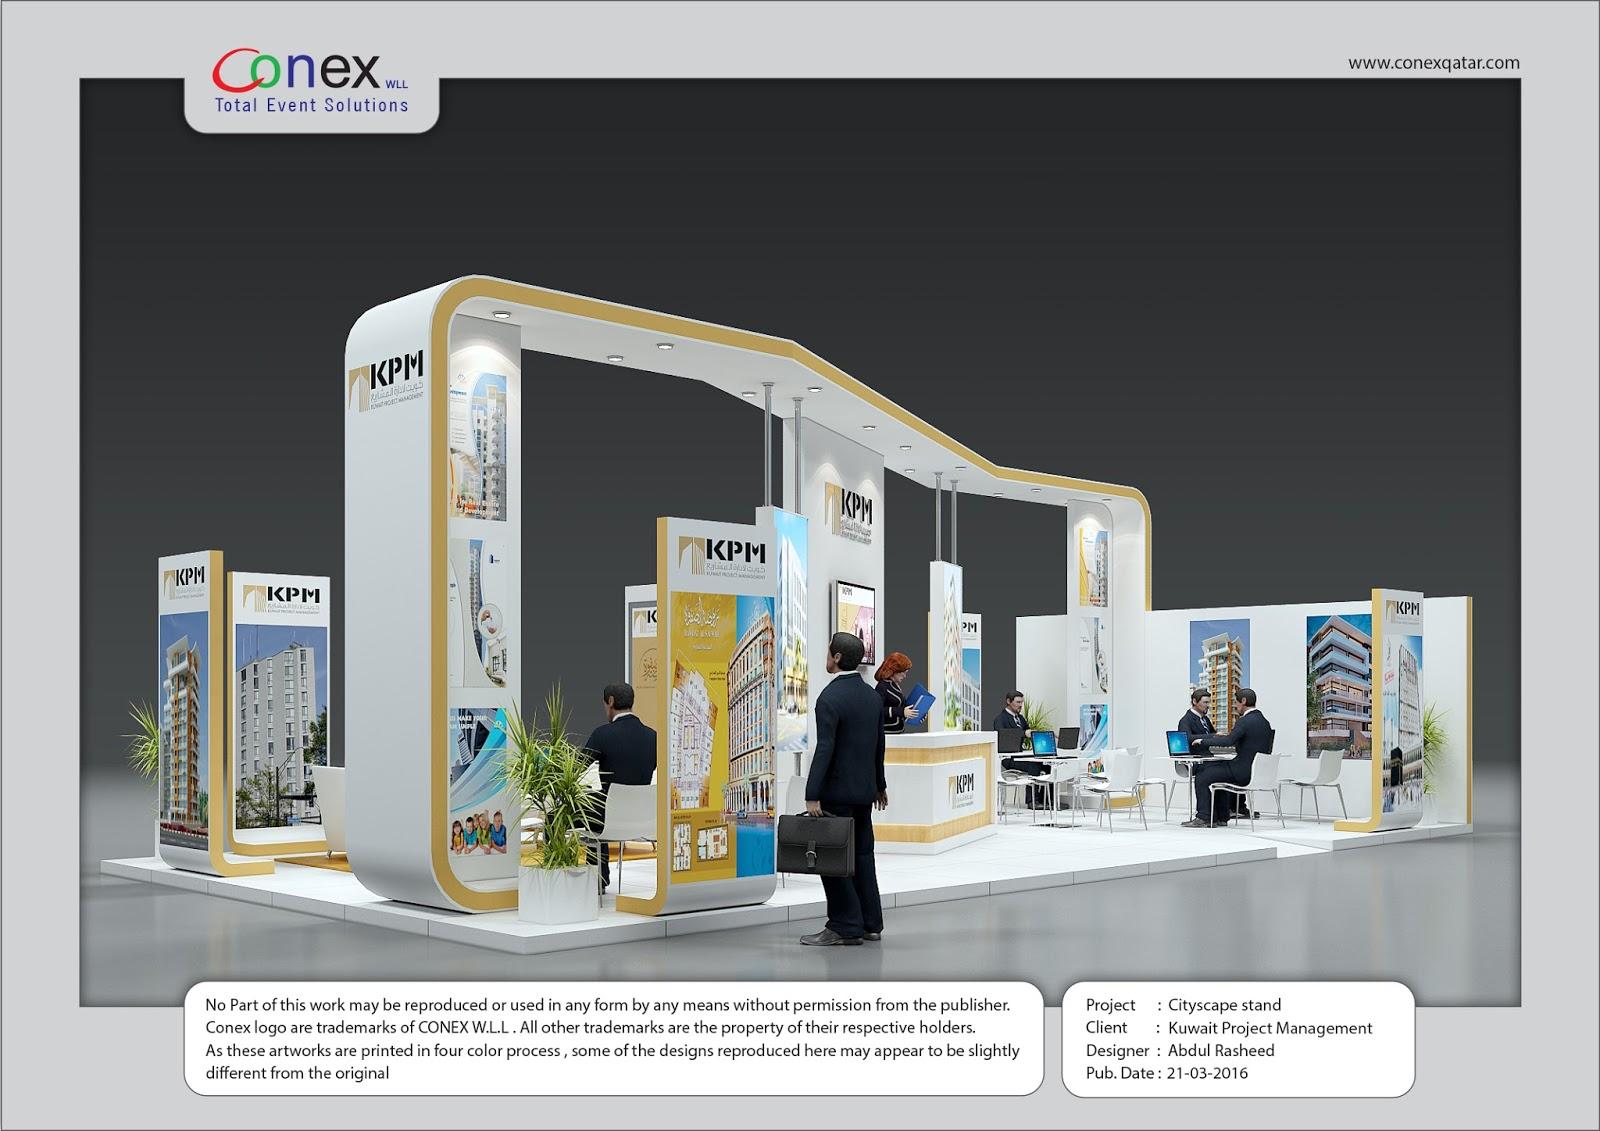 Exhibition Stand In Kuwait : D designer visualizer events exhibitions interiors